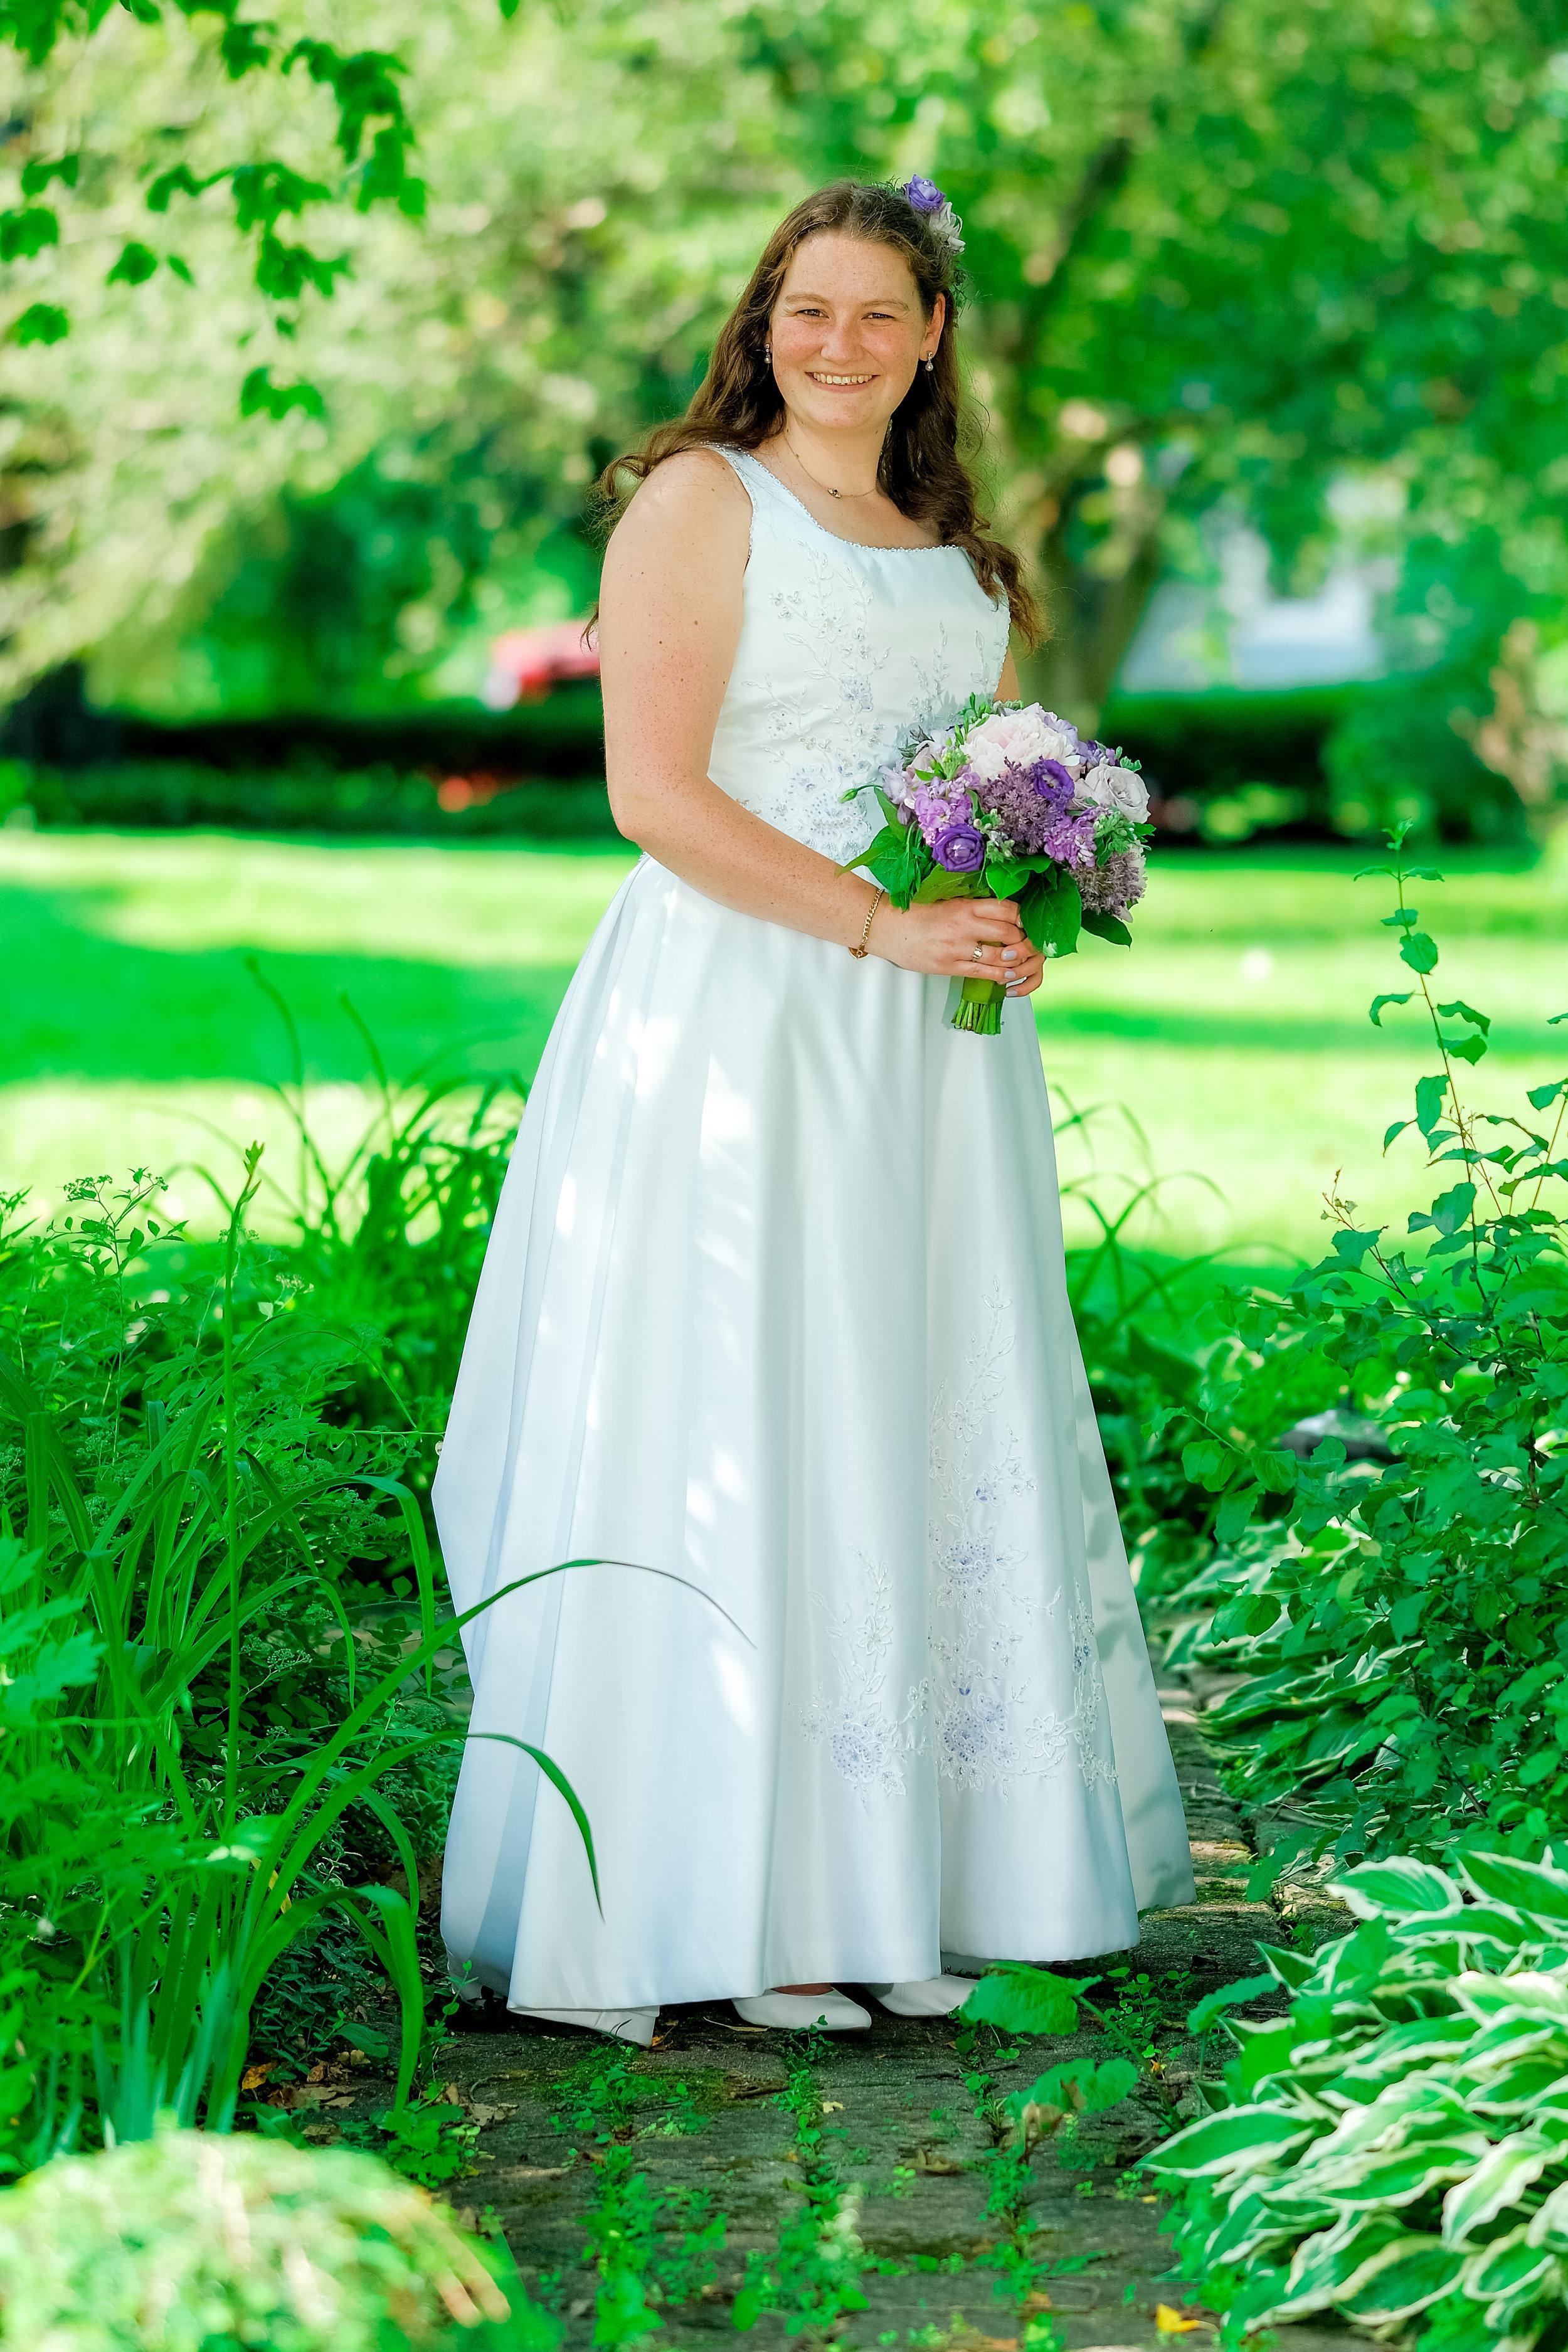 Vermont-Lilac-Inn-Wedding-Photography-706.jpg